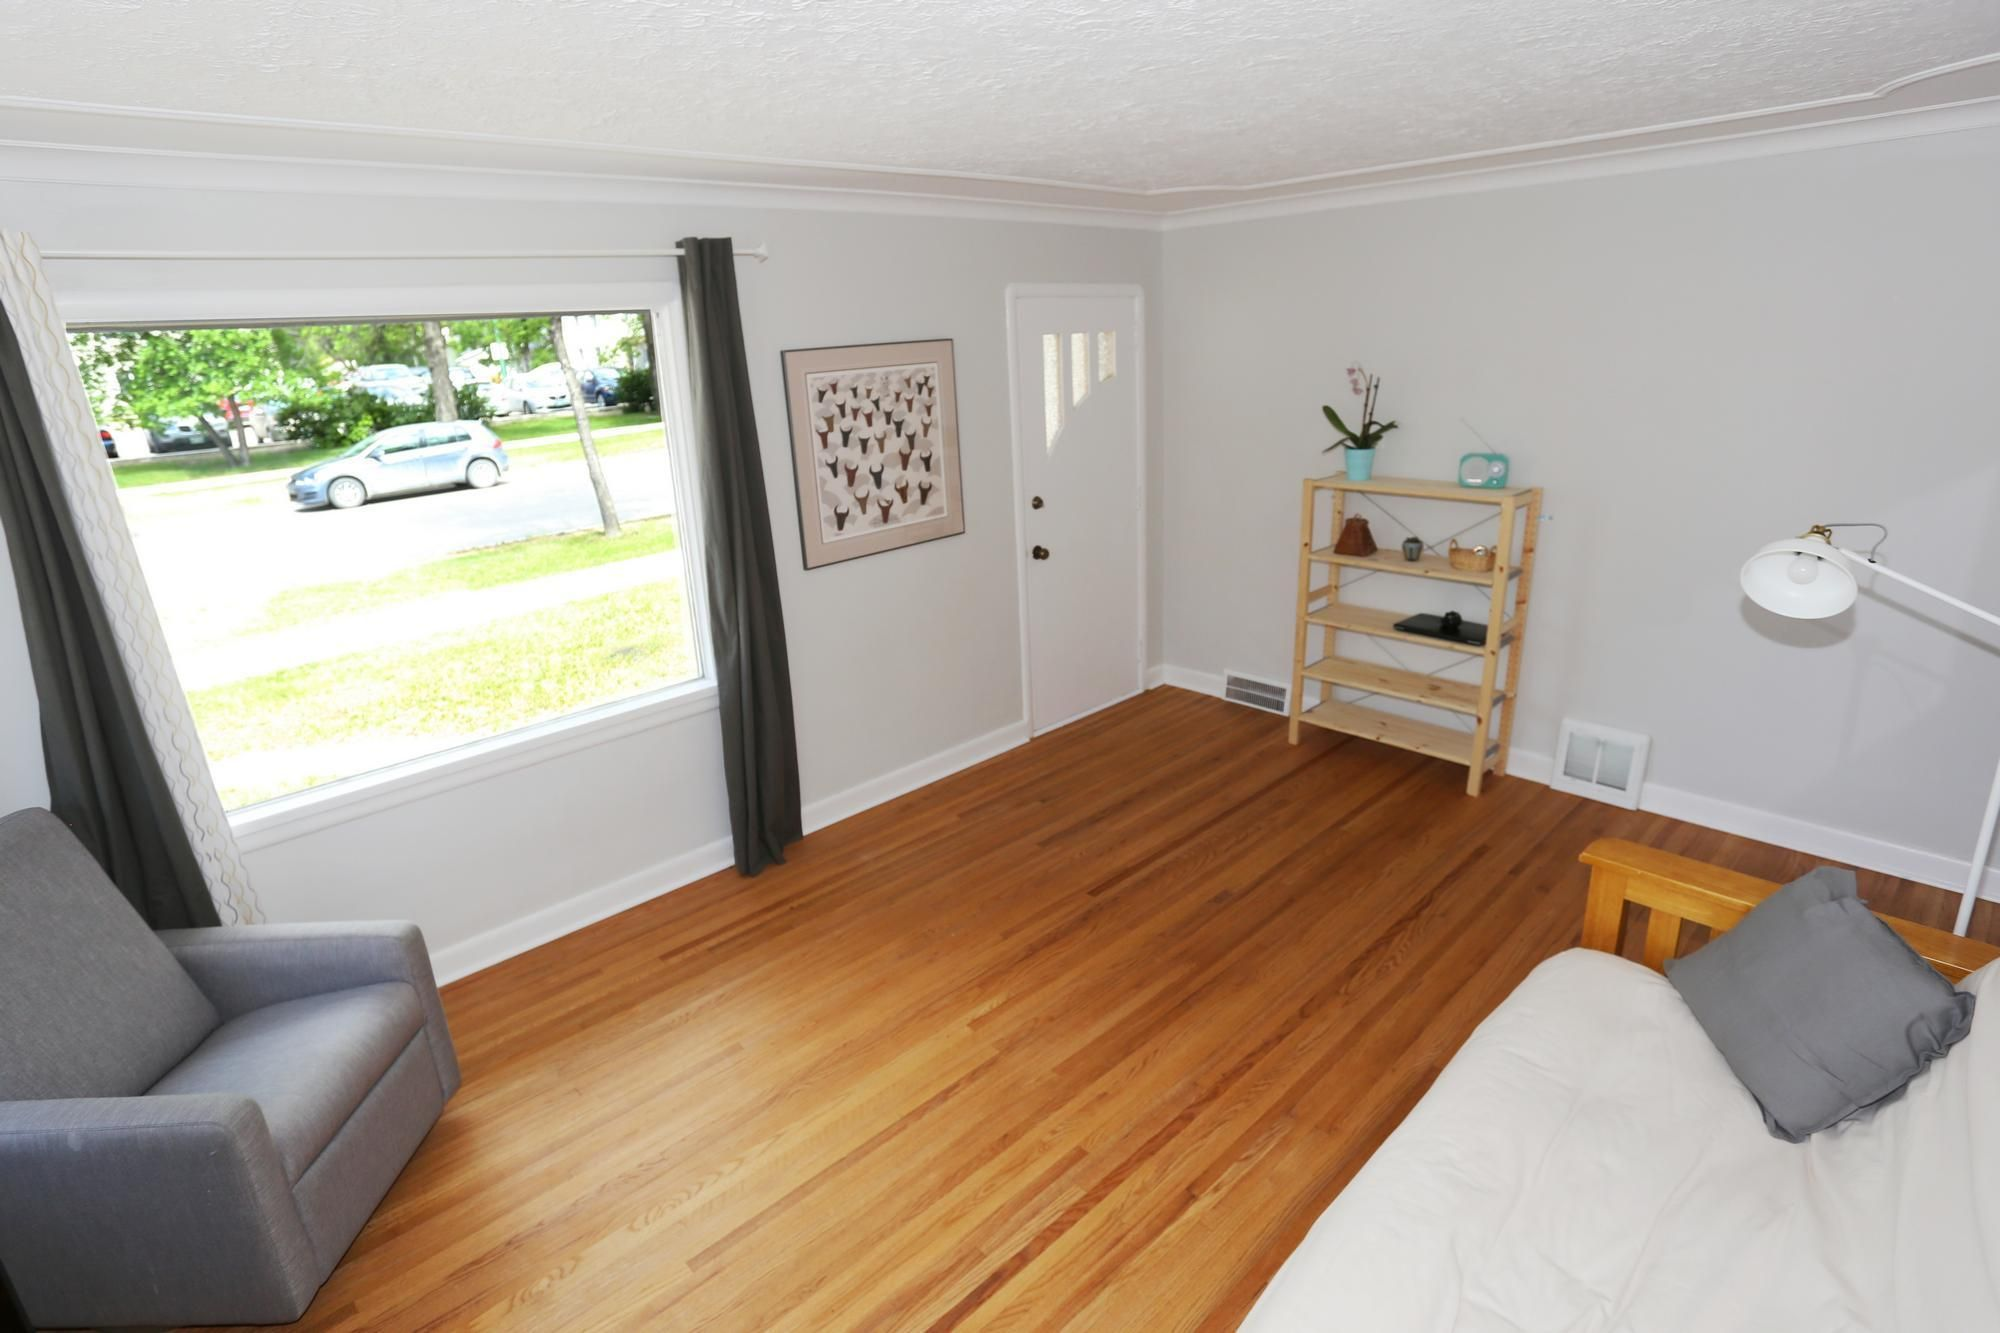 Photo 7: Photos: 290 McLeod Avenue in Winnipeg: North Kildonan Single Family Detached for sale (3F)  : MLS®# 1814938